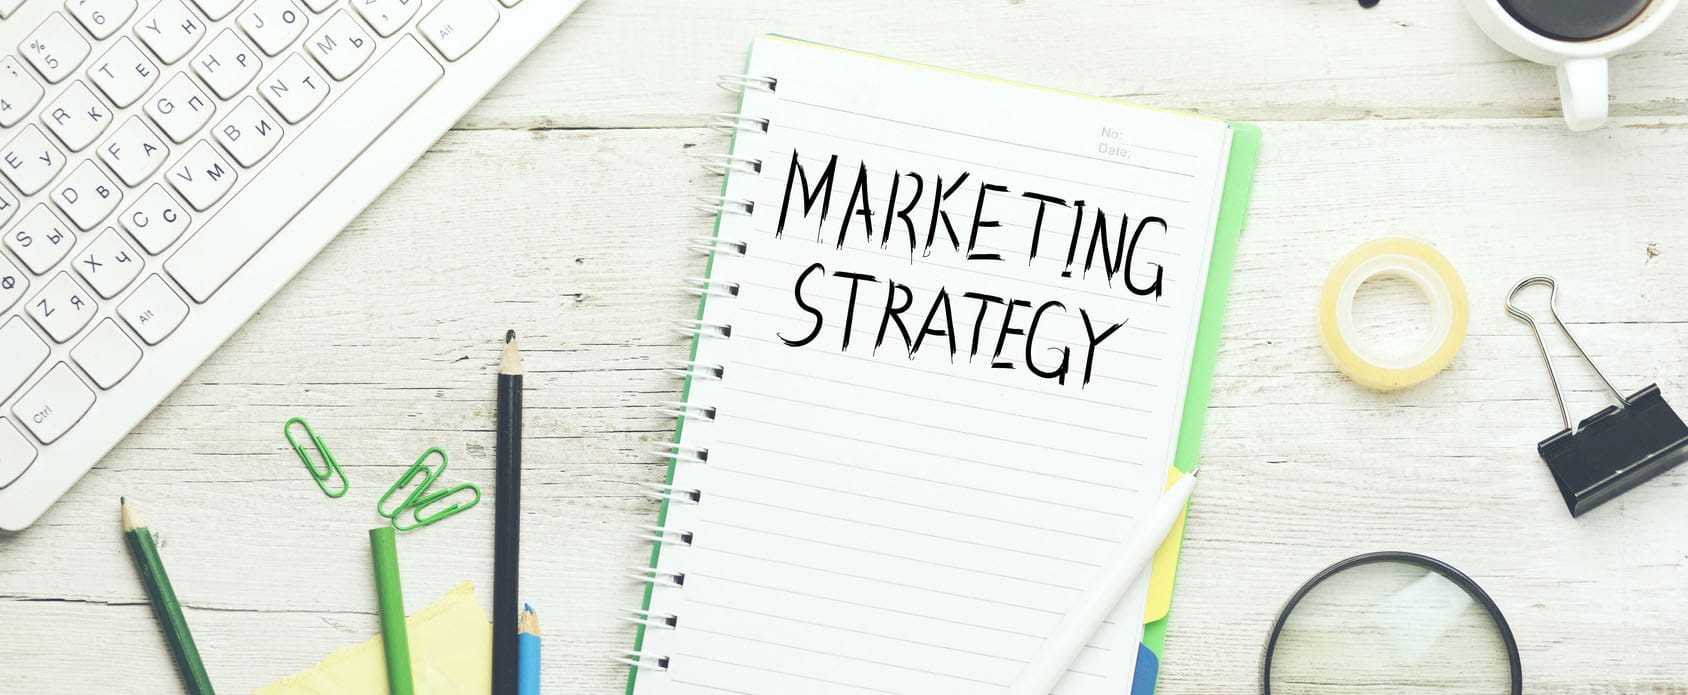 Strategi Pemasaran Online Marketing Yang Efektif Untuk Pemula